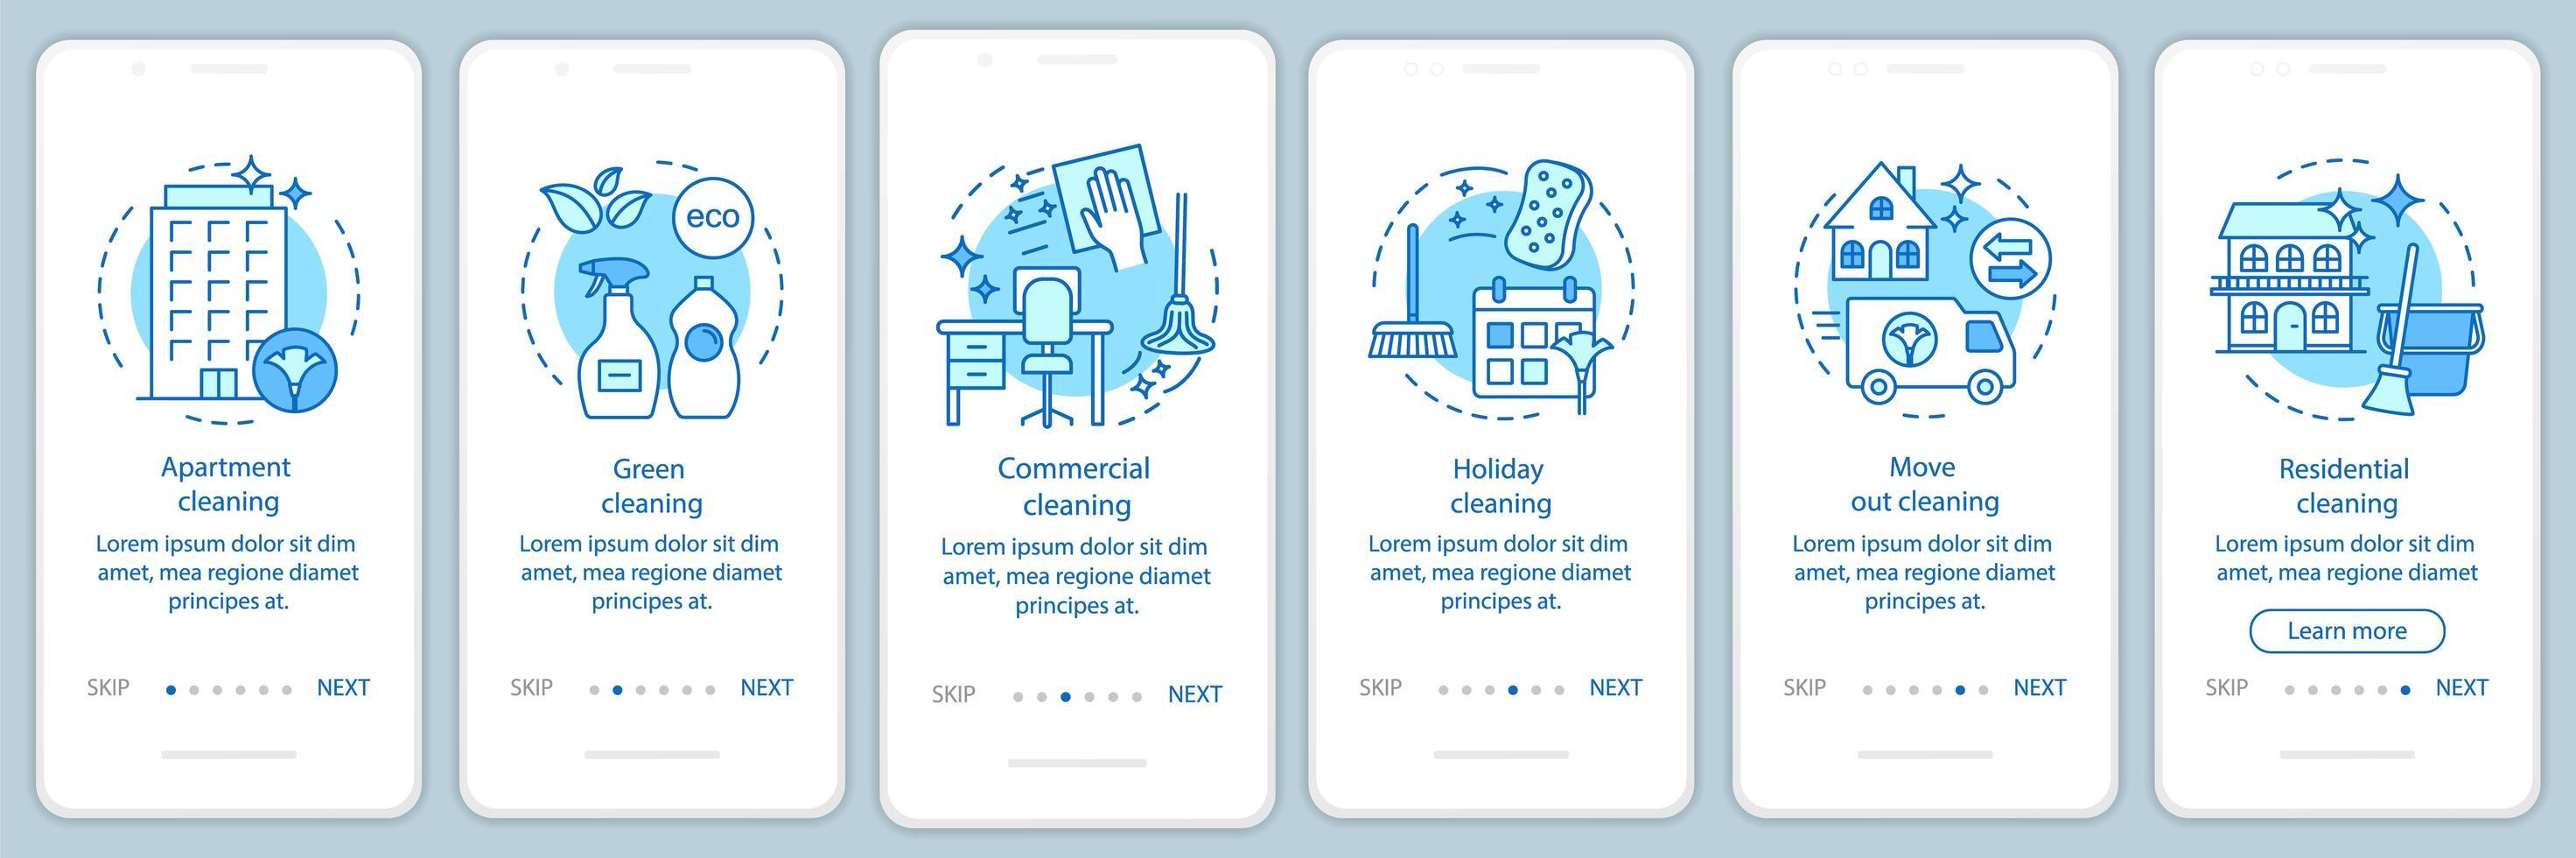 Reinigungsservice Onboarding mobile App vektor